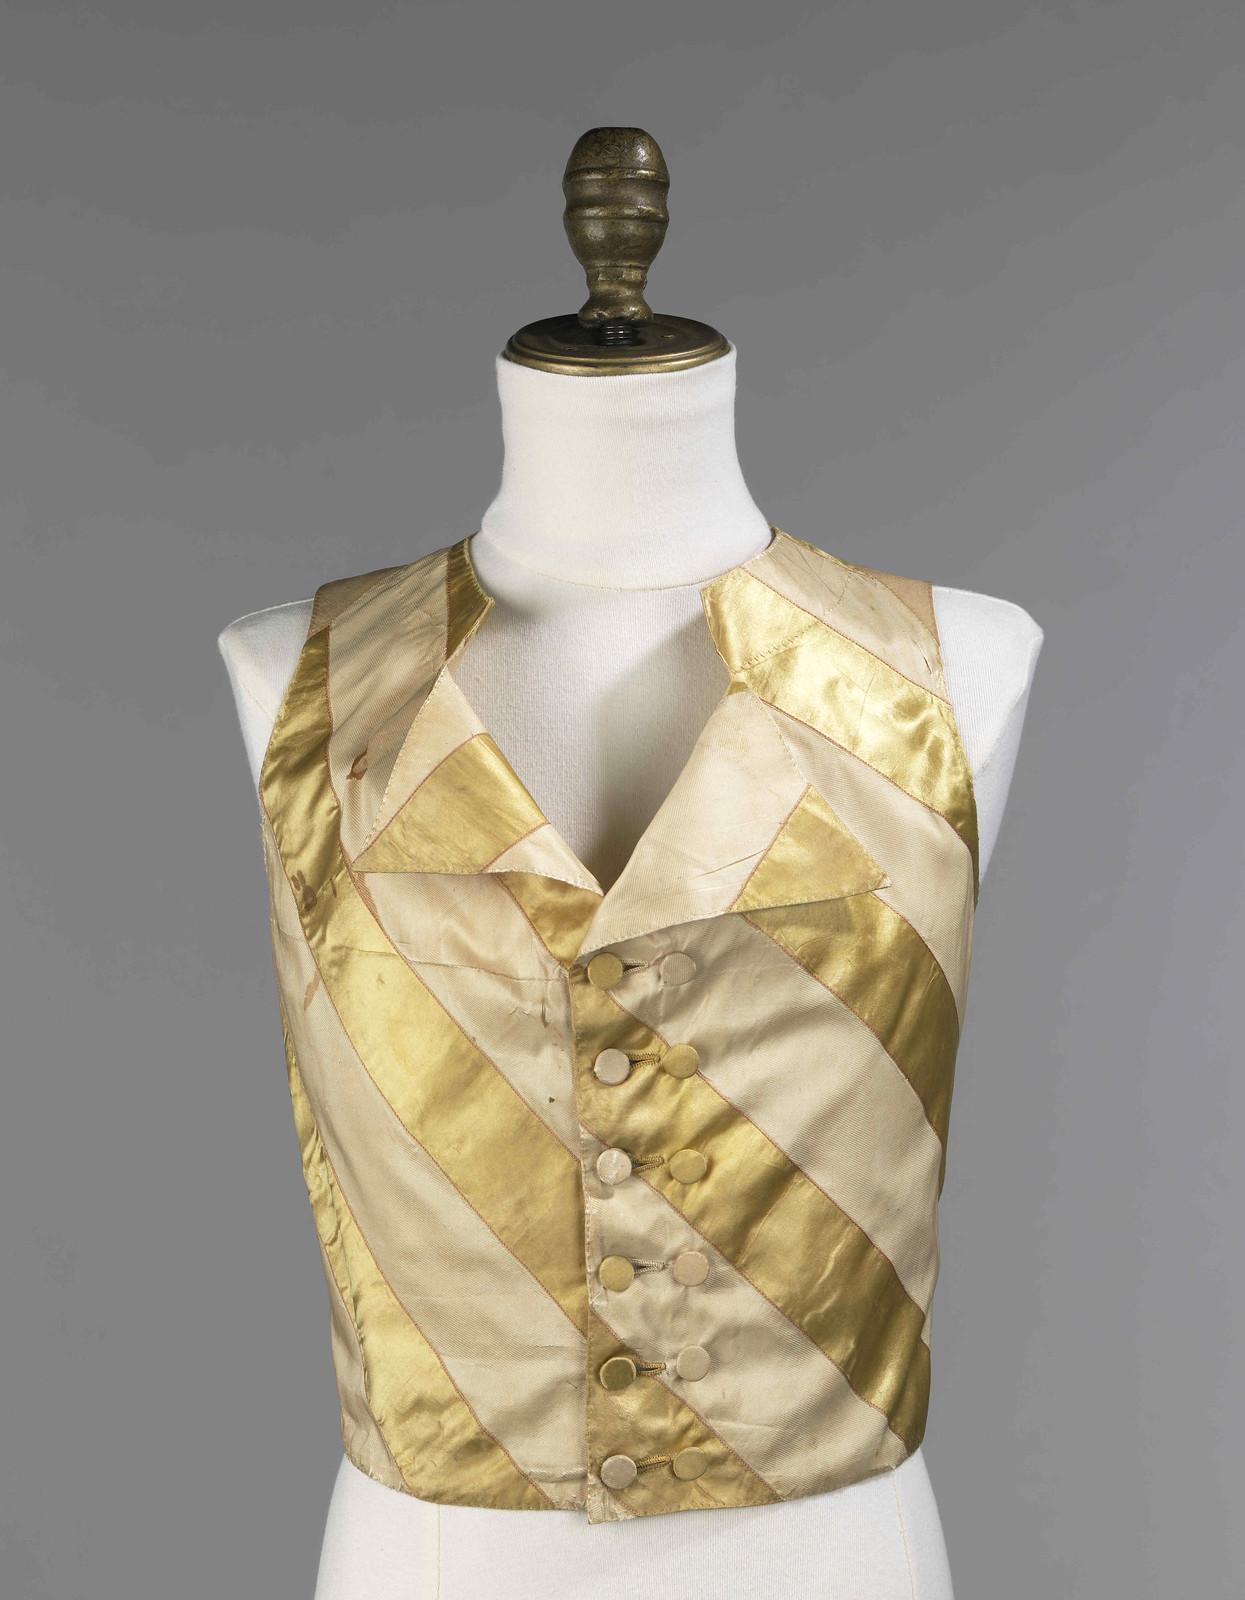 1810. American. Silk, linen. metmuseum